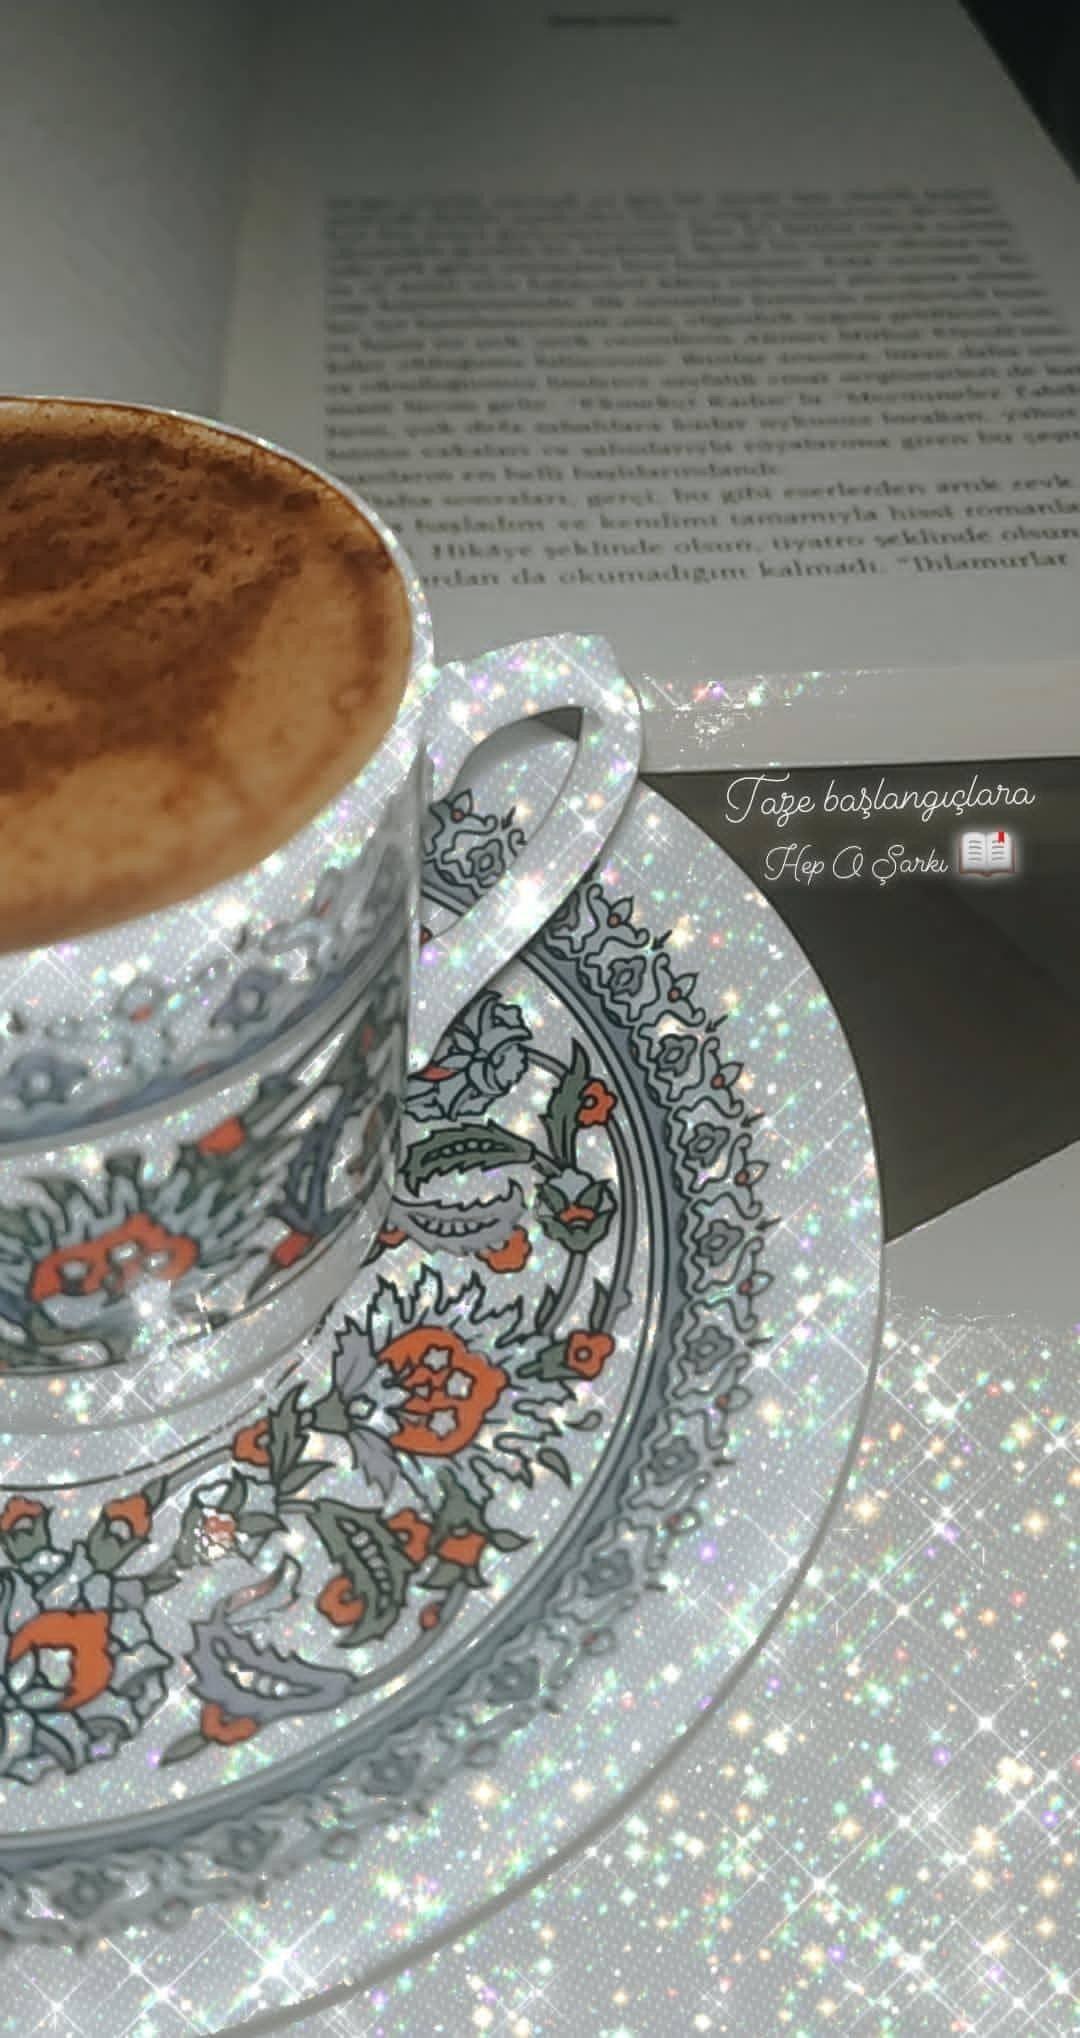 #instagram #instamood #instastory #mood #story #book #coffee